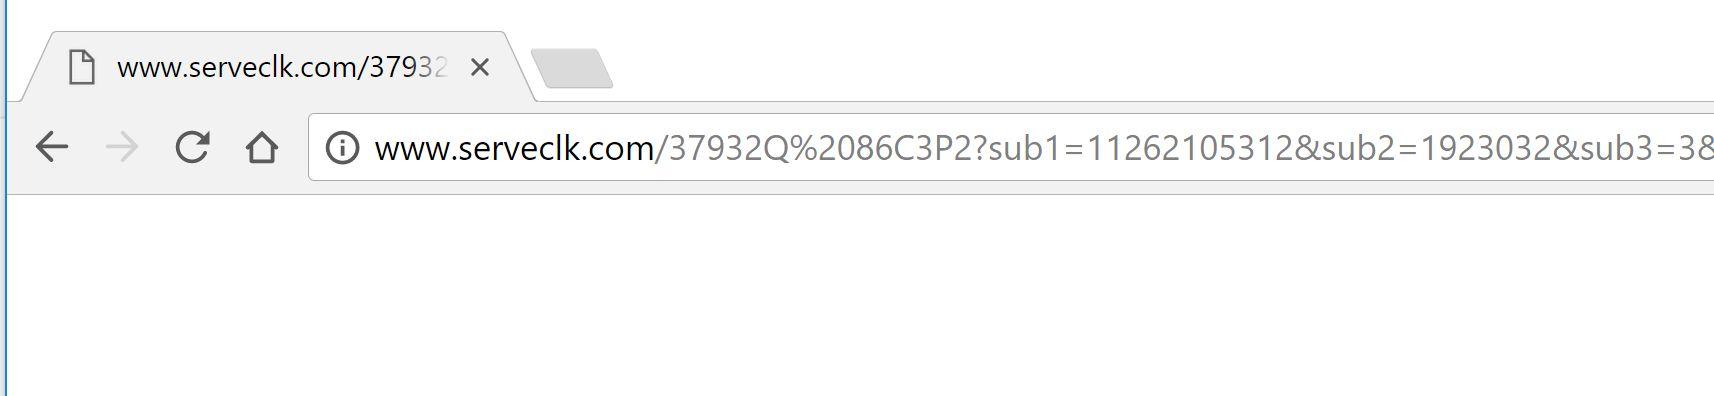 www.serveclk.com Virus